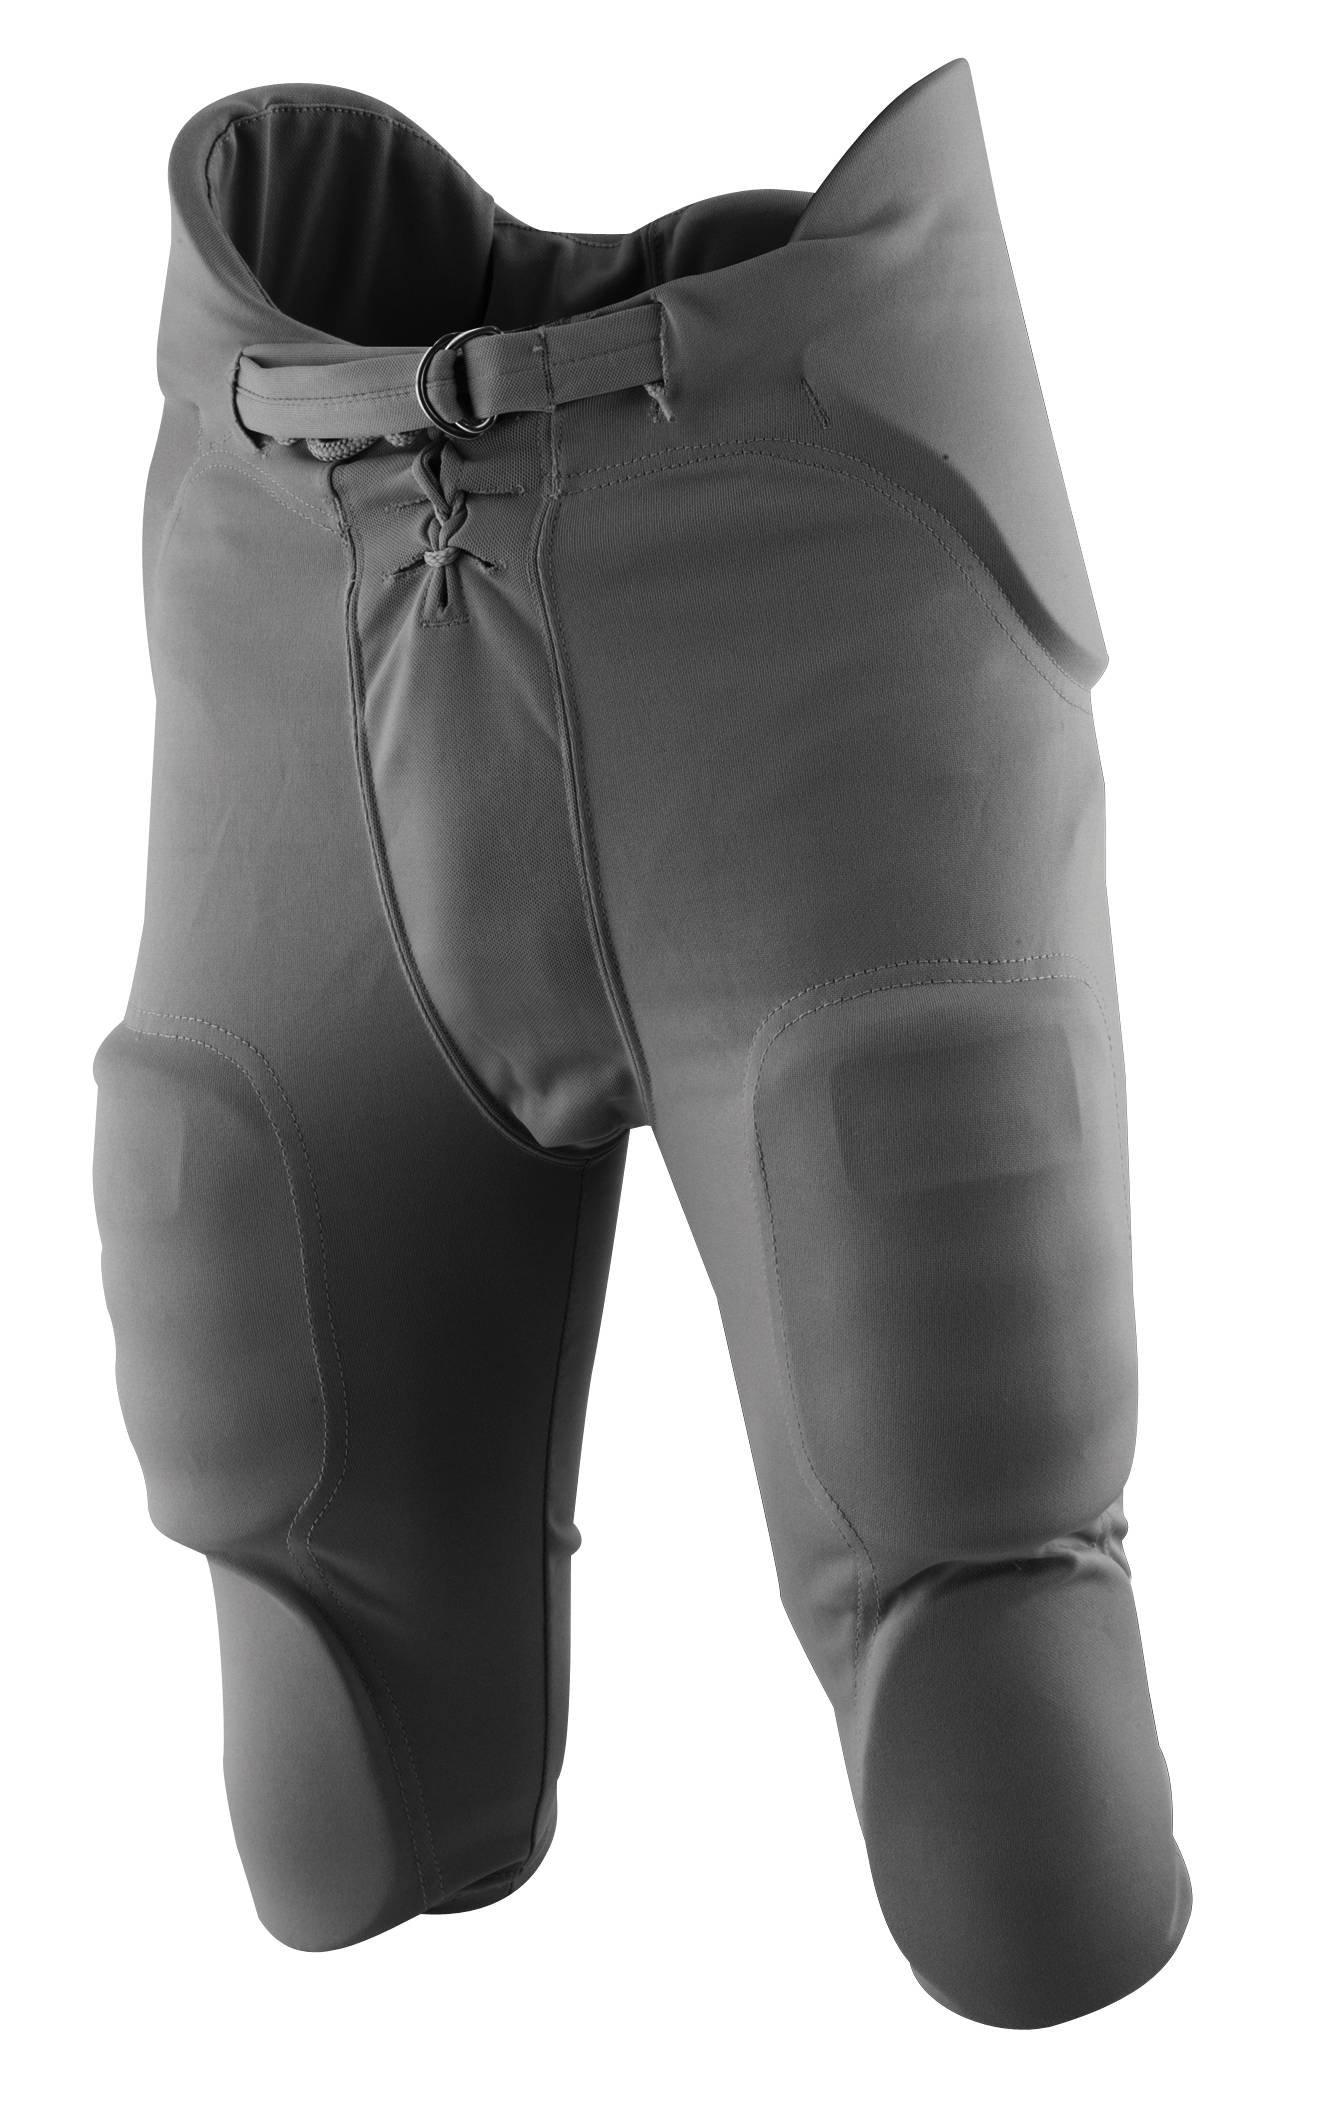 Rawlings Men's F3500P Football Pant (Graphite, X-Small)